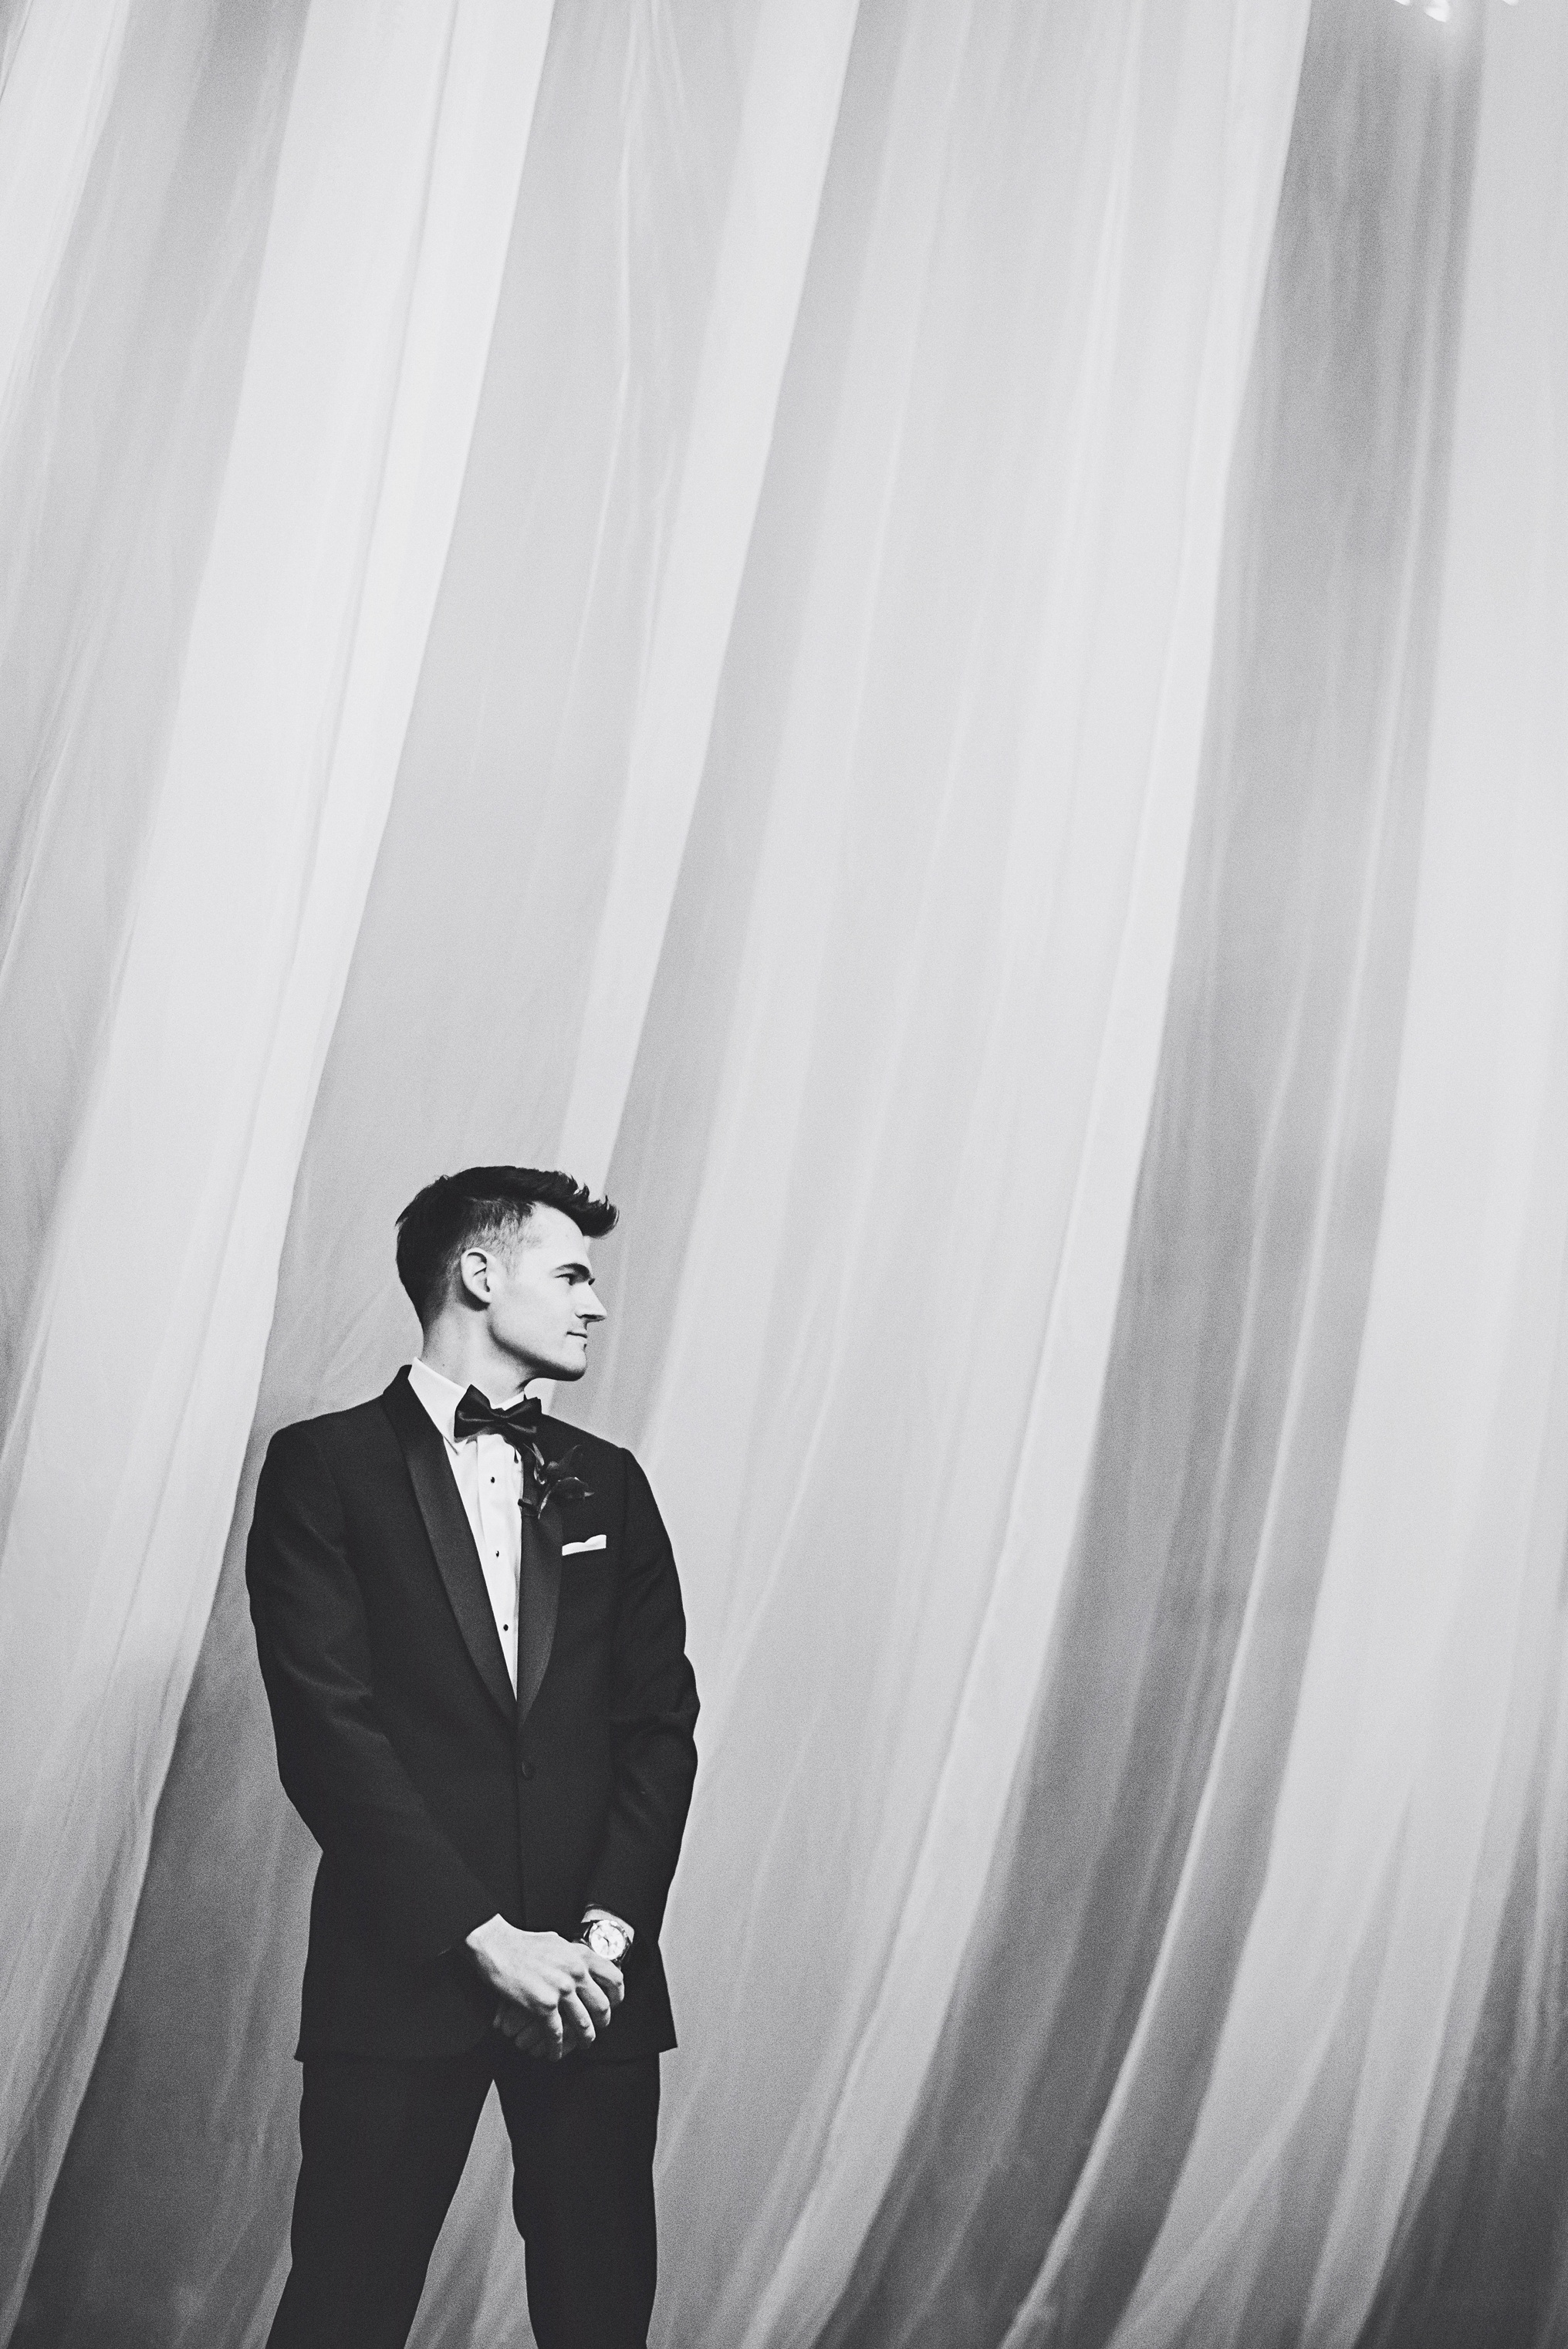 best_wedding_photography_2017_by_lucas_botz_photography_130.jpg